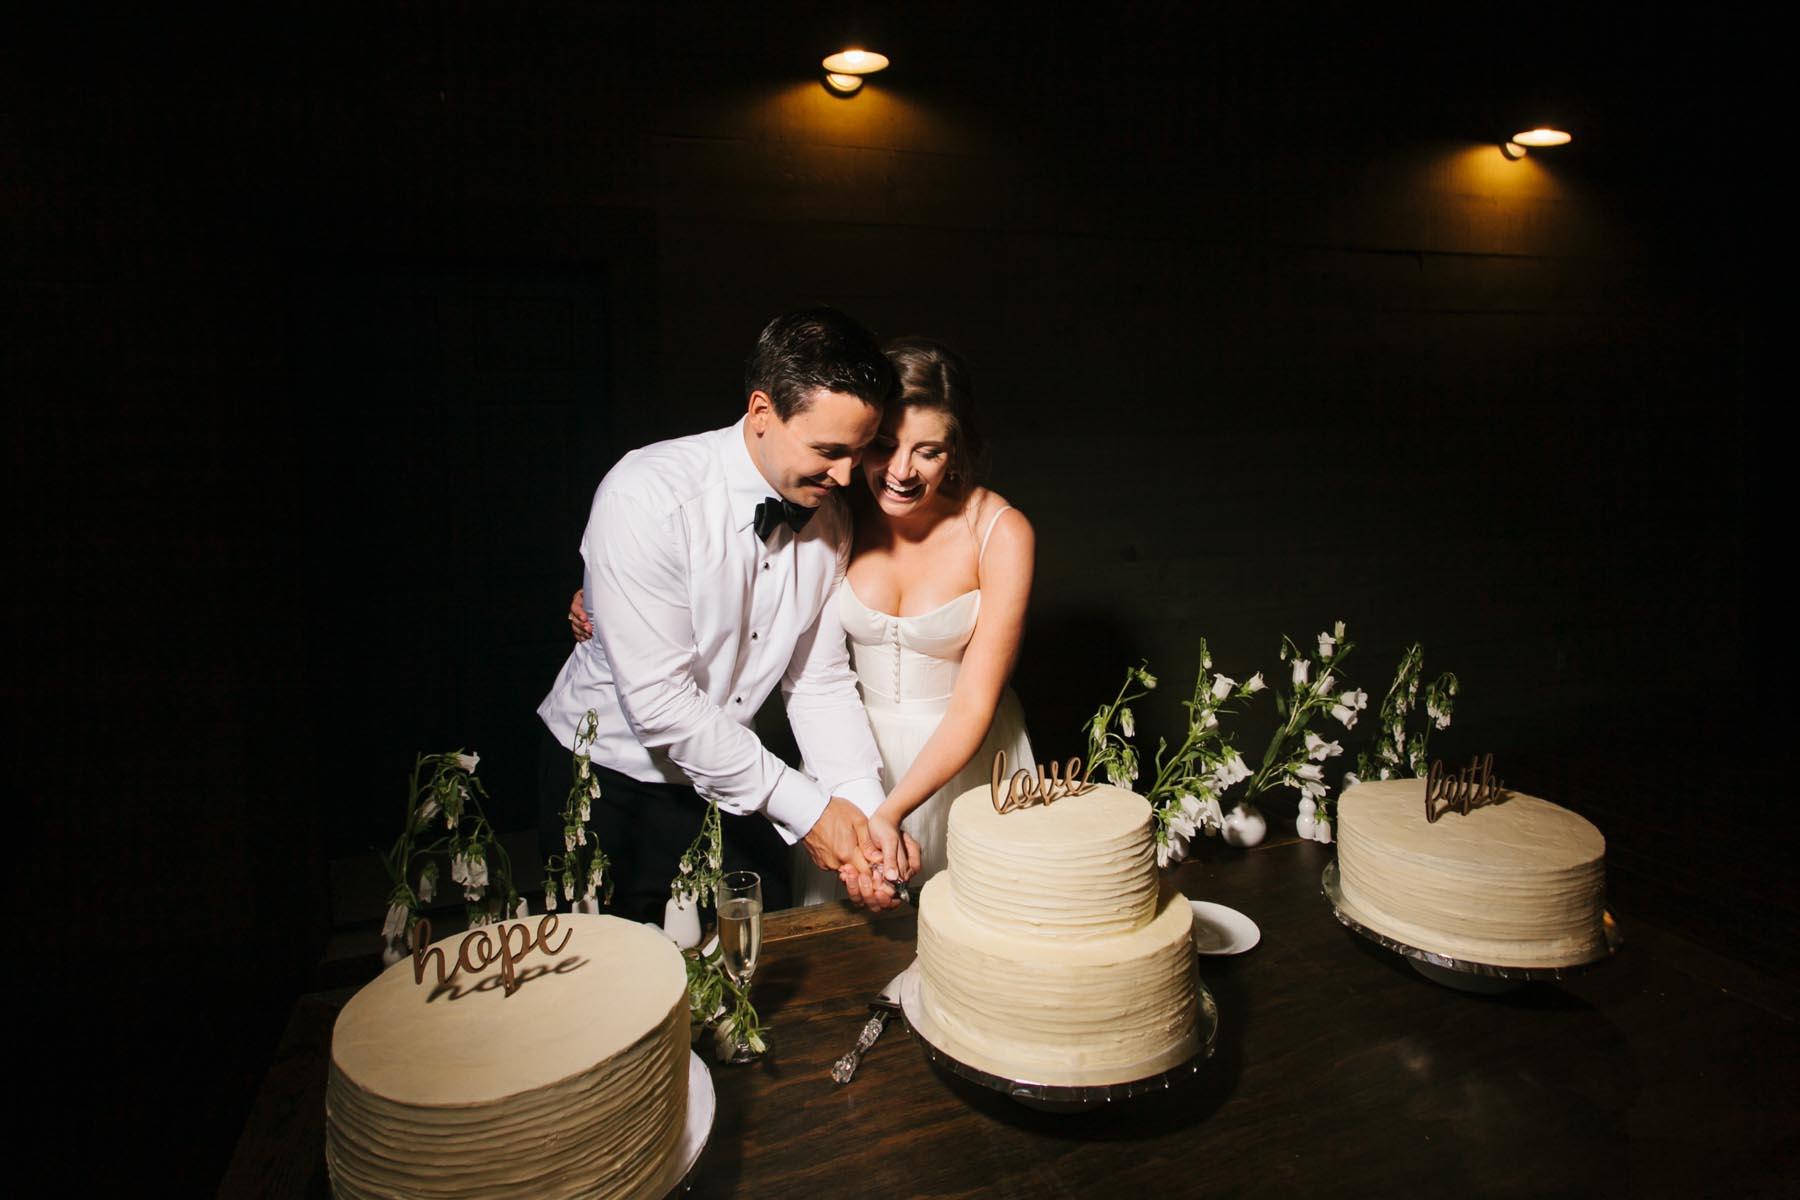 lowry wedding blog eden garden florida wedding-145